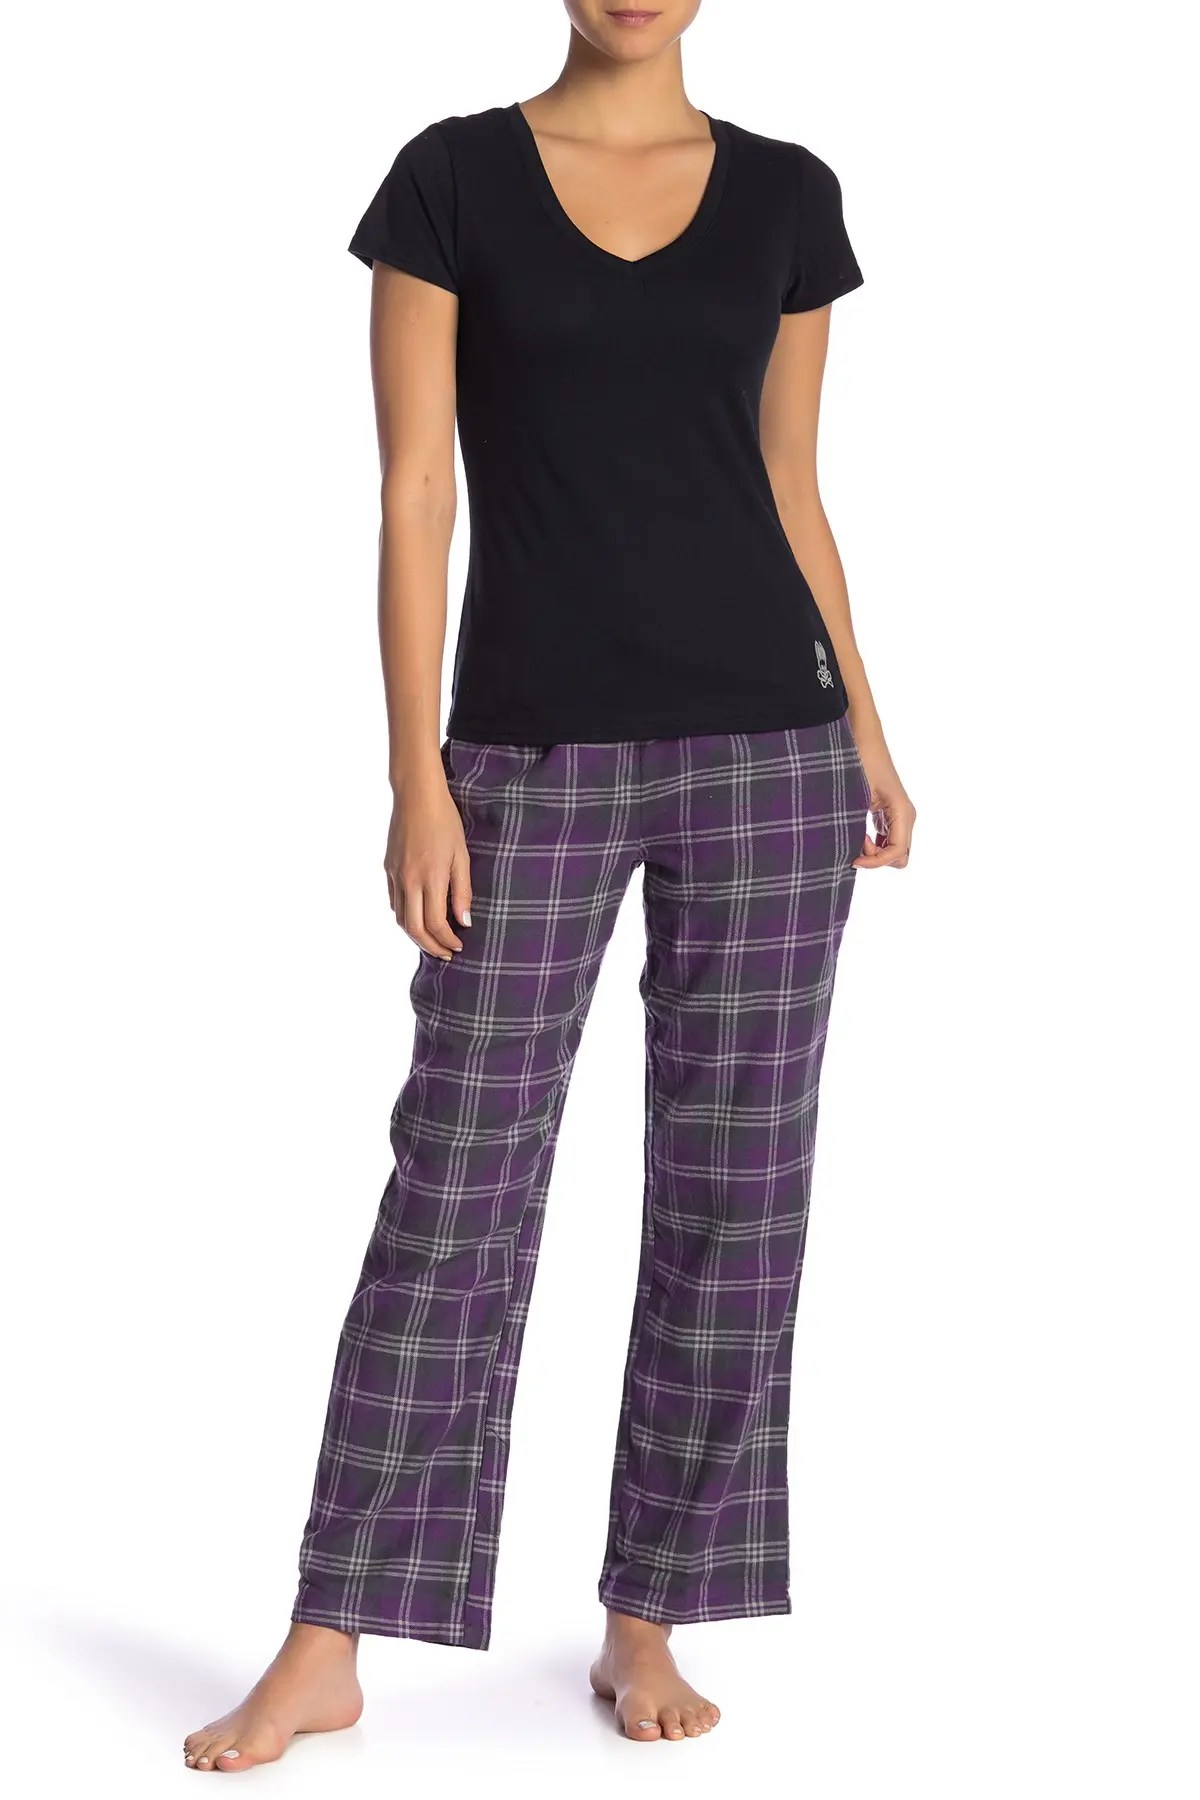 https www nordstromrack com brands psycho 20bunny women clothing sleepwear 20 20robes pajama 20sets